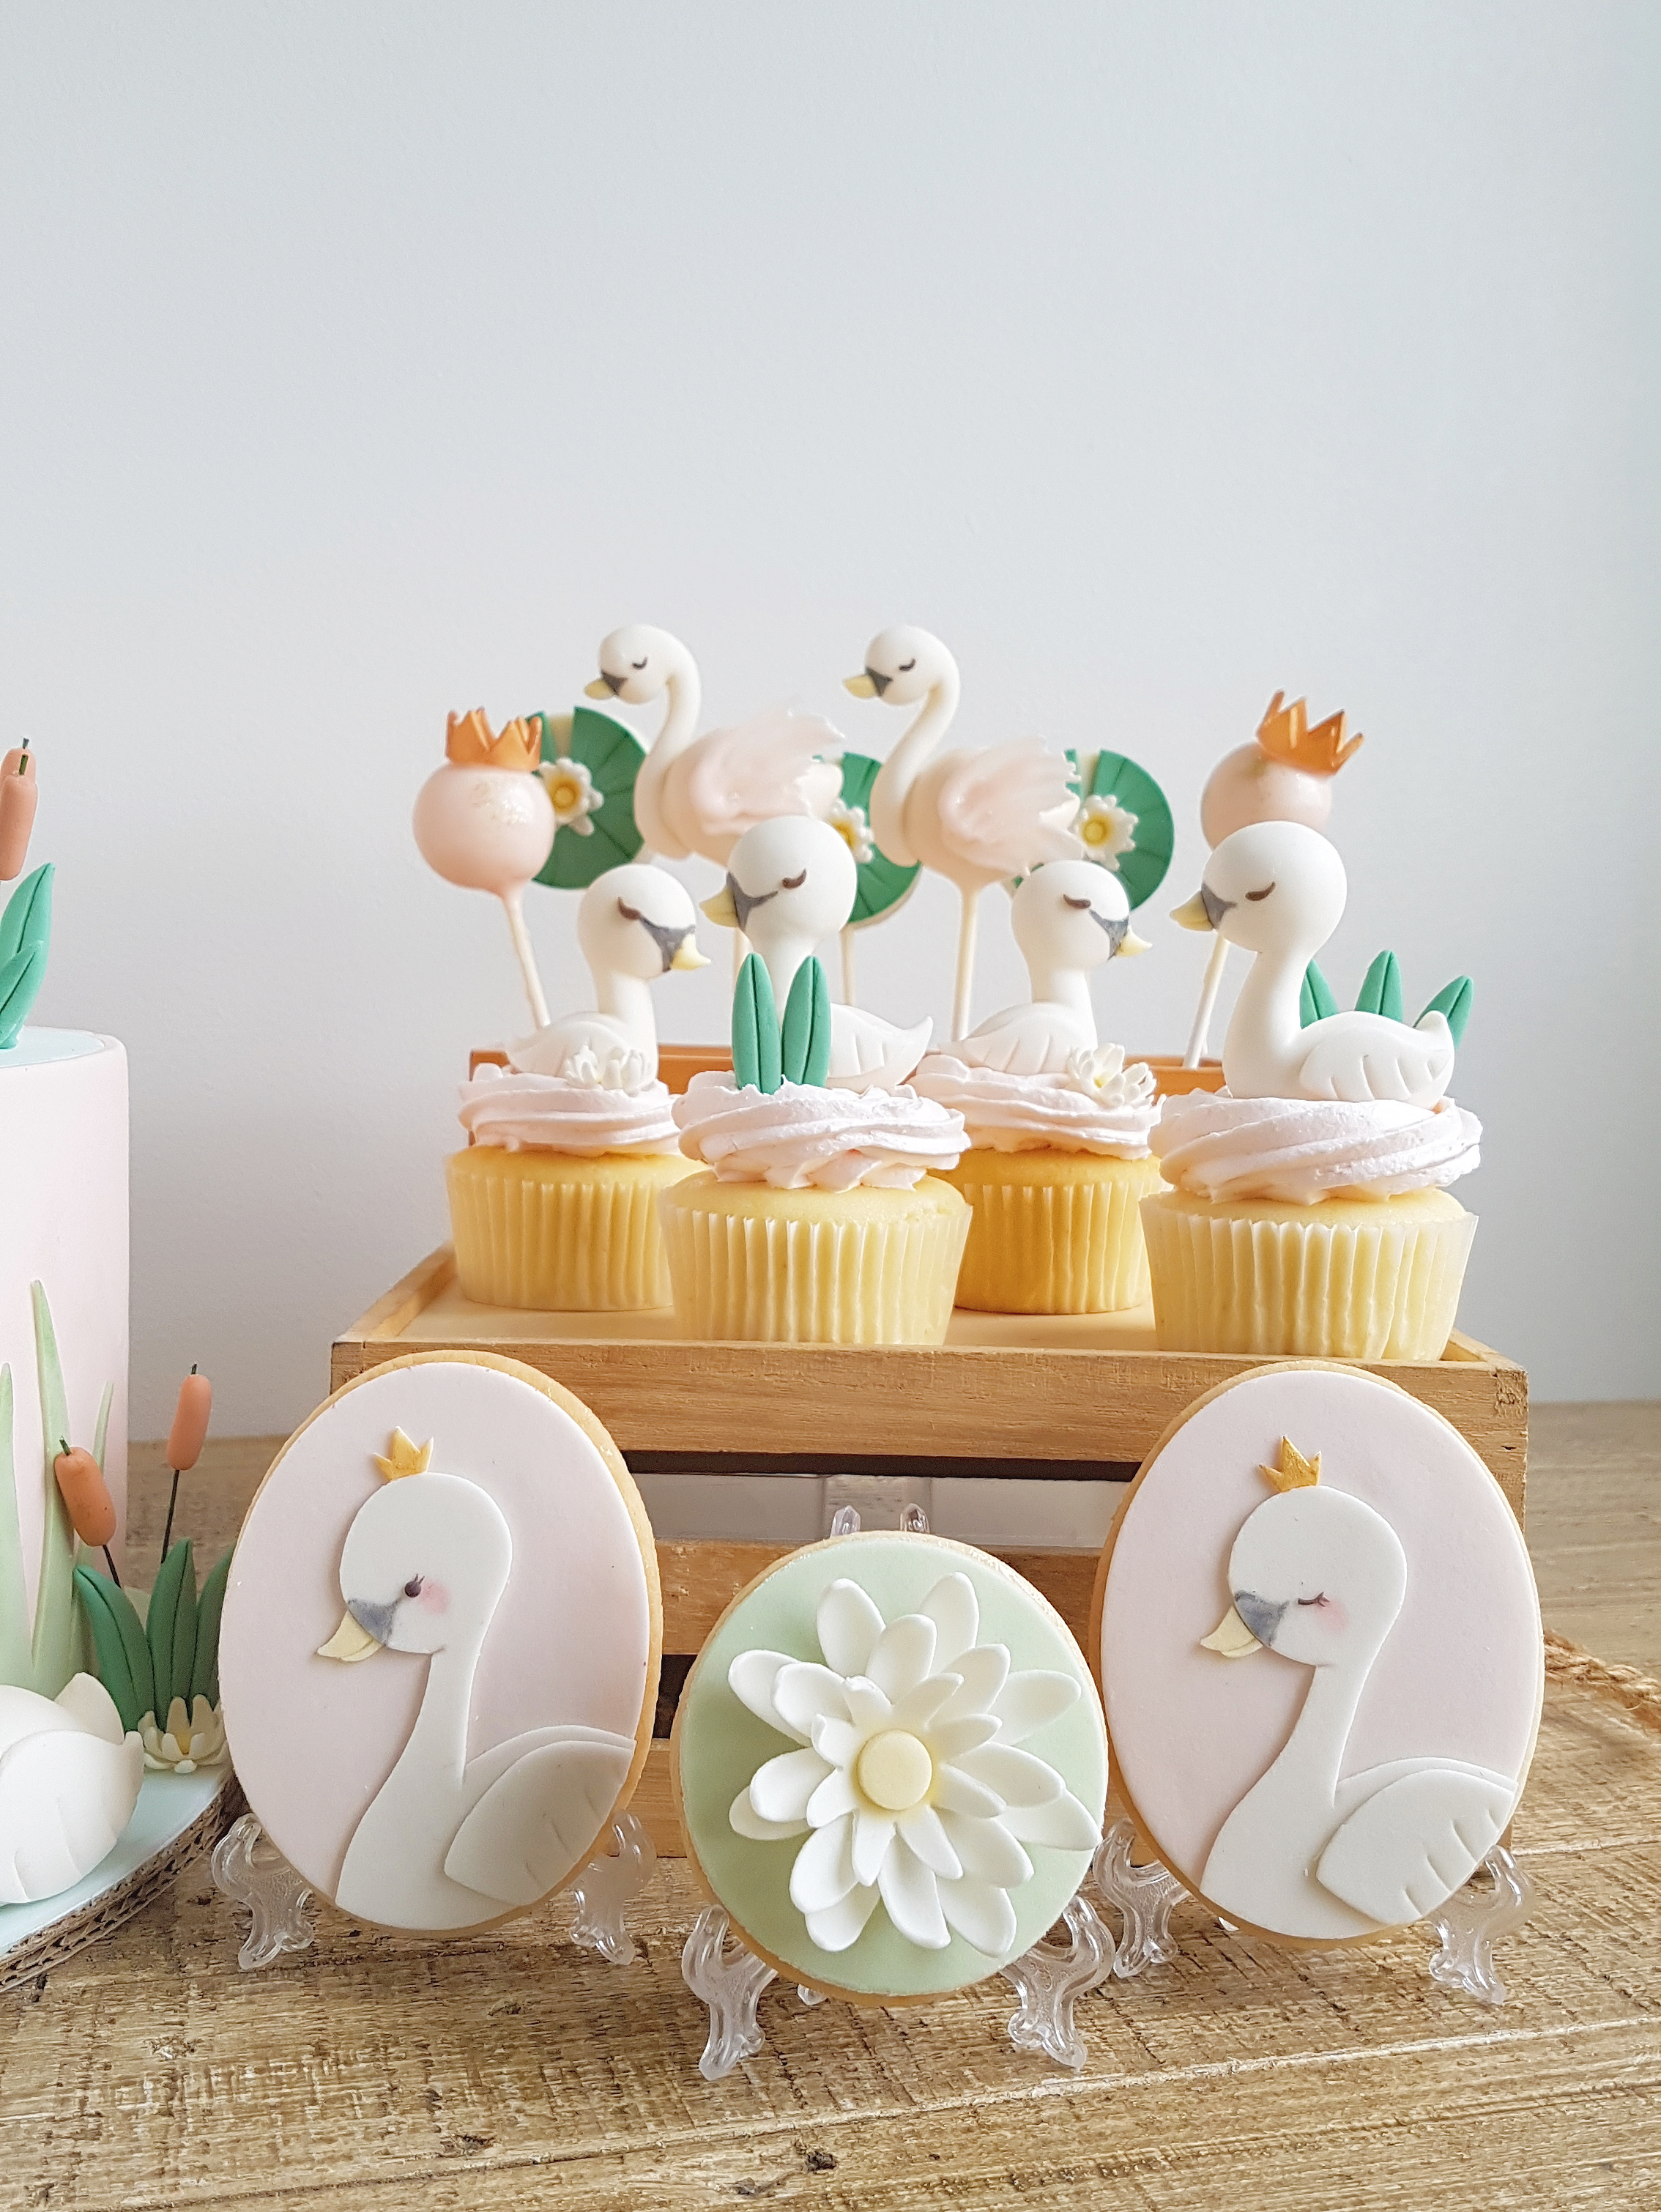 Cottontail Cake Studio Sugar Art Amp Pastries